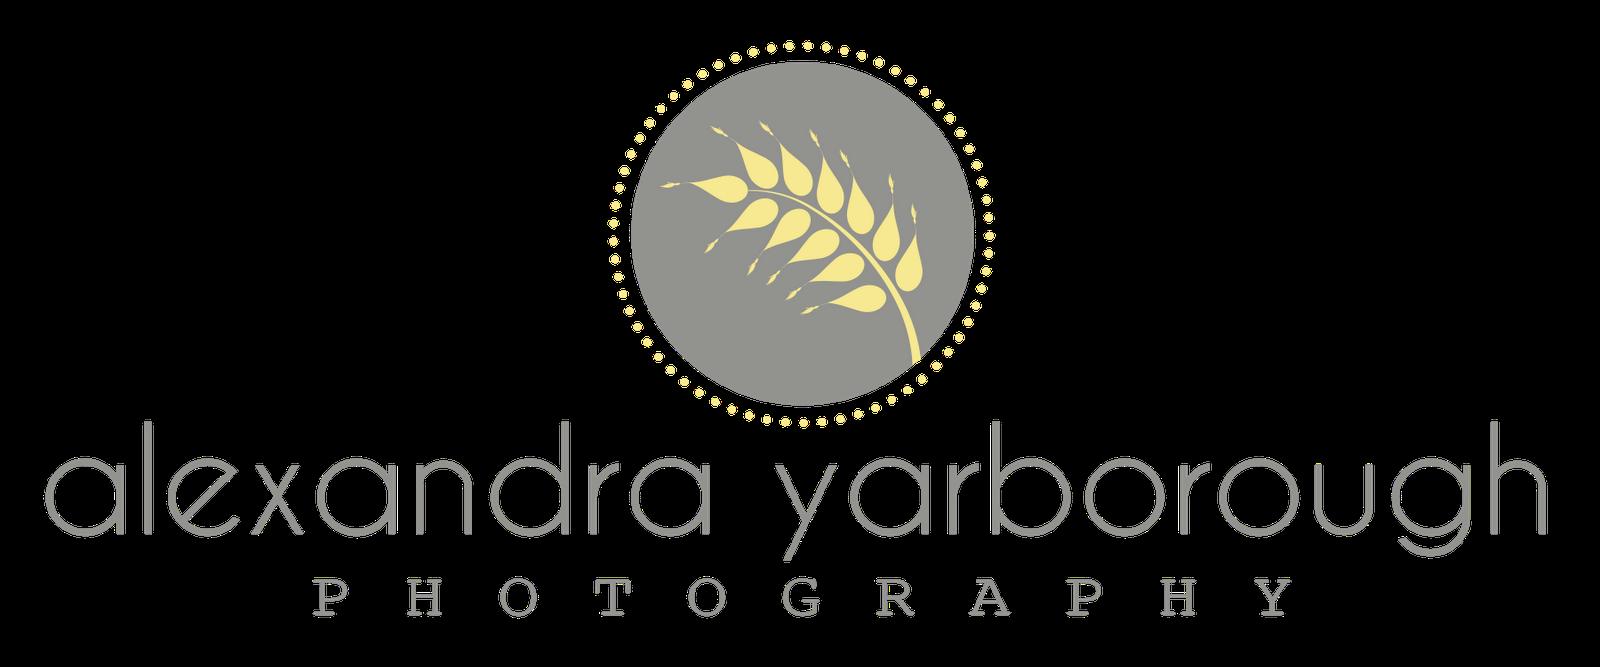 Polish Logo Design: New Photography Logos